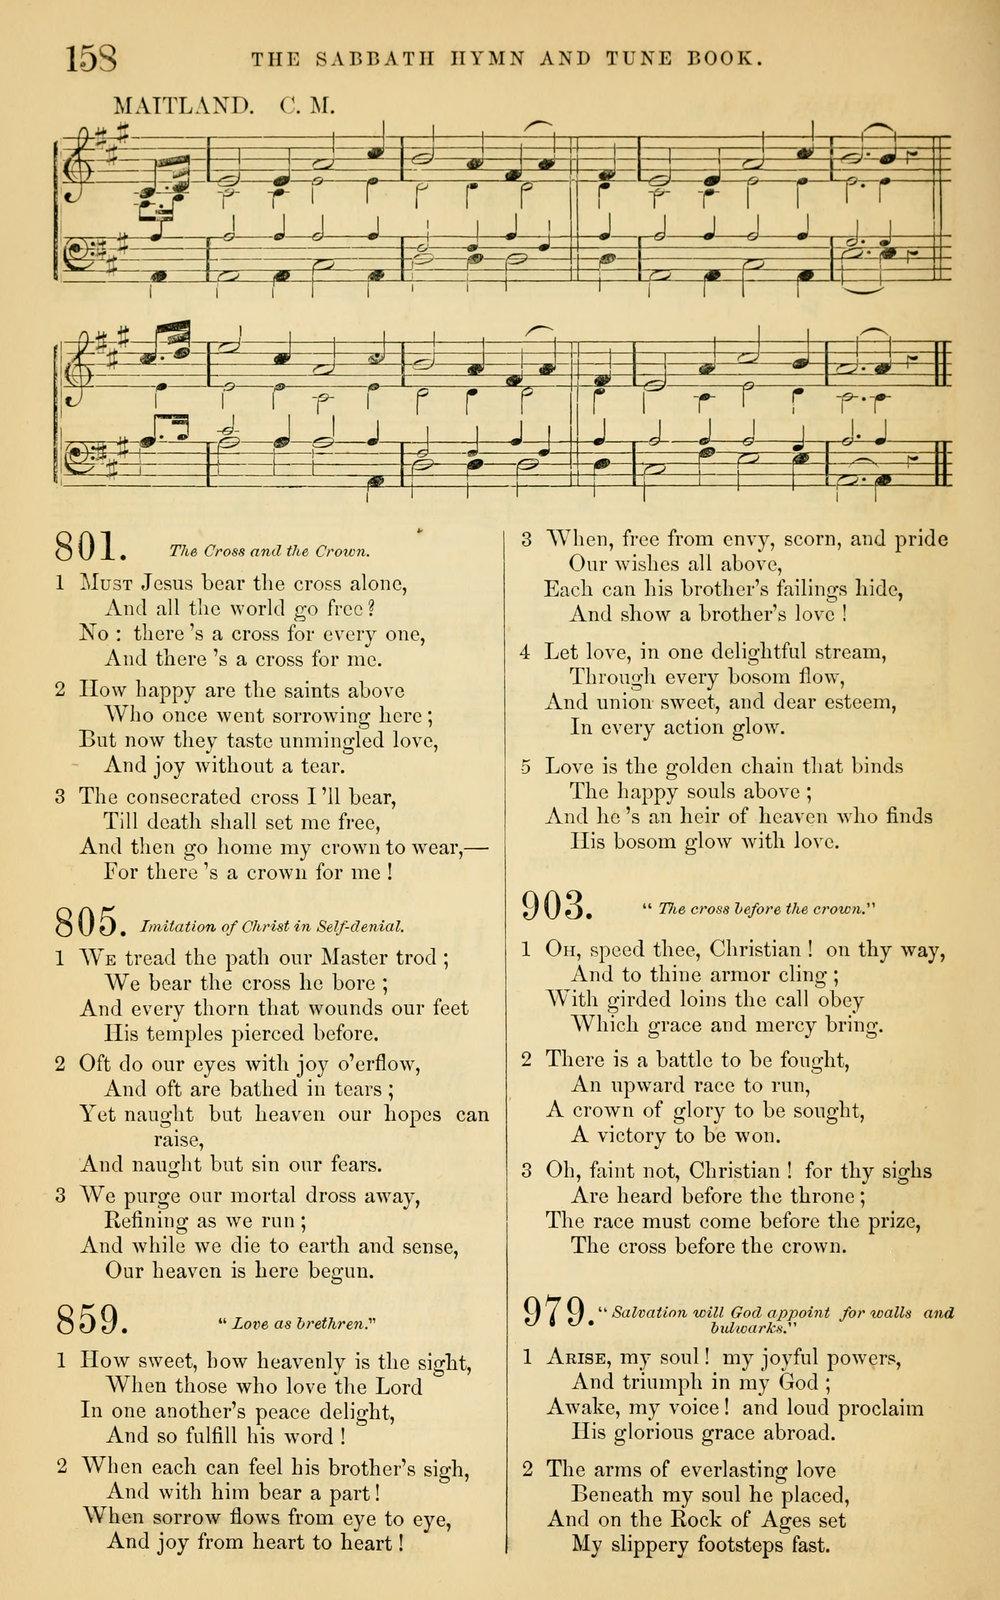 Fig. 4.   The Sabbath Hymn and Tune Book  (NY: Mason Brothers, 1859).